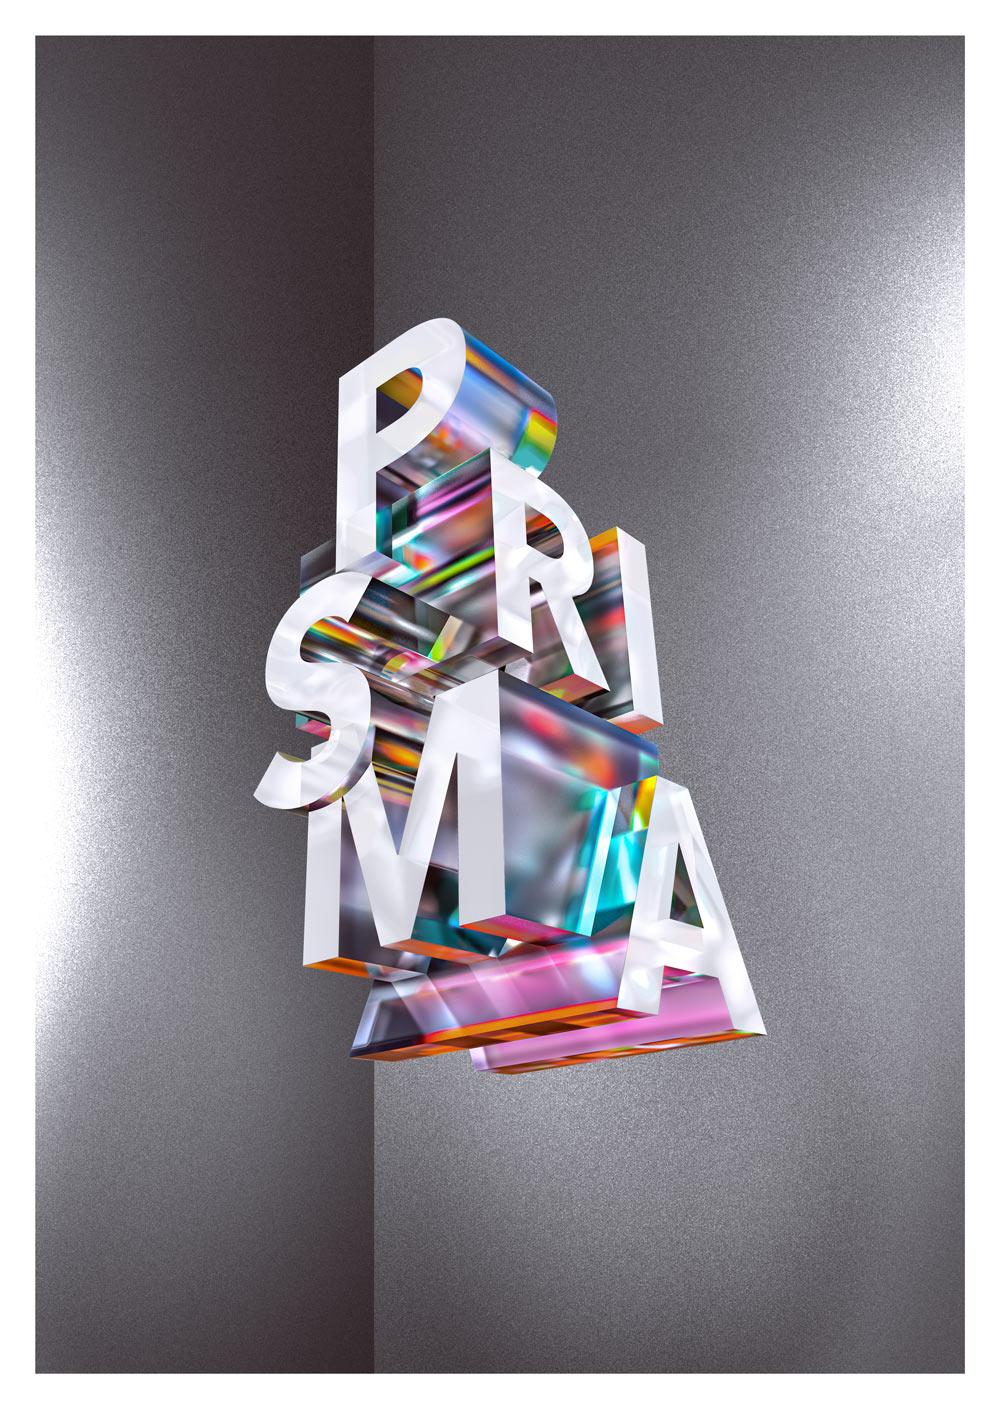 Prisma Prism Exhibition HSRM